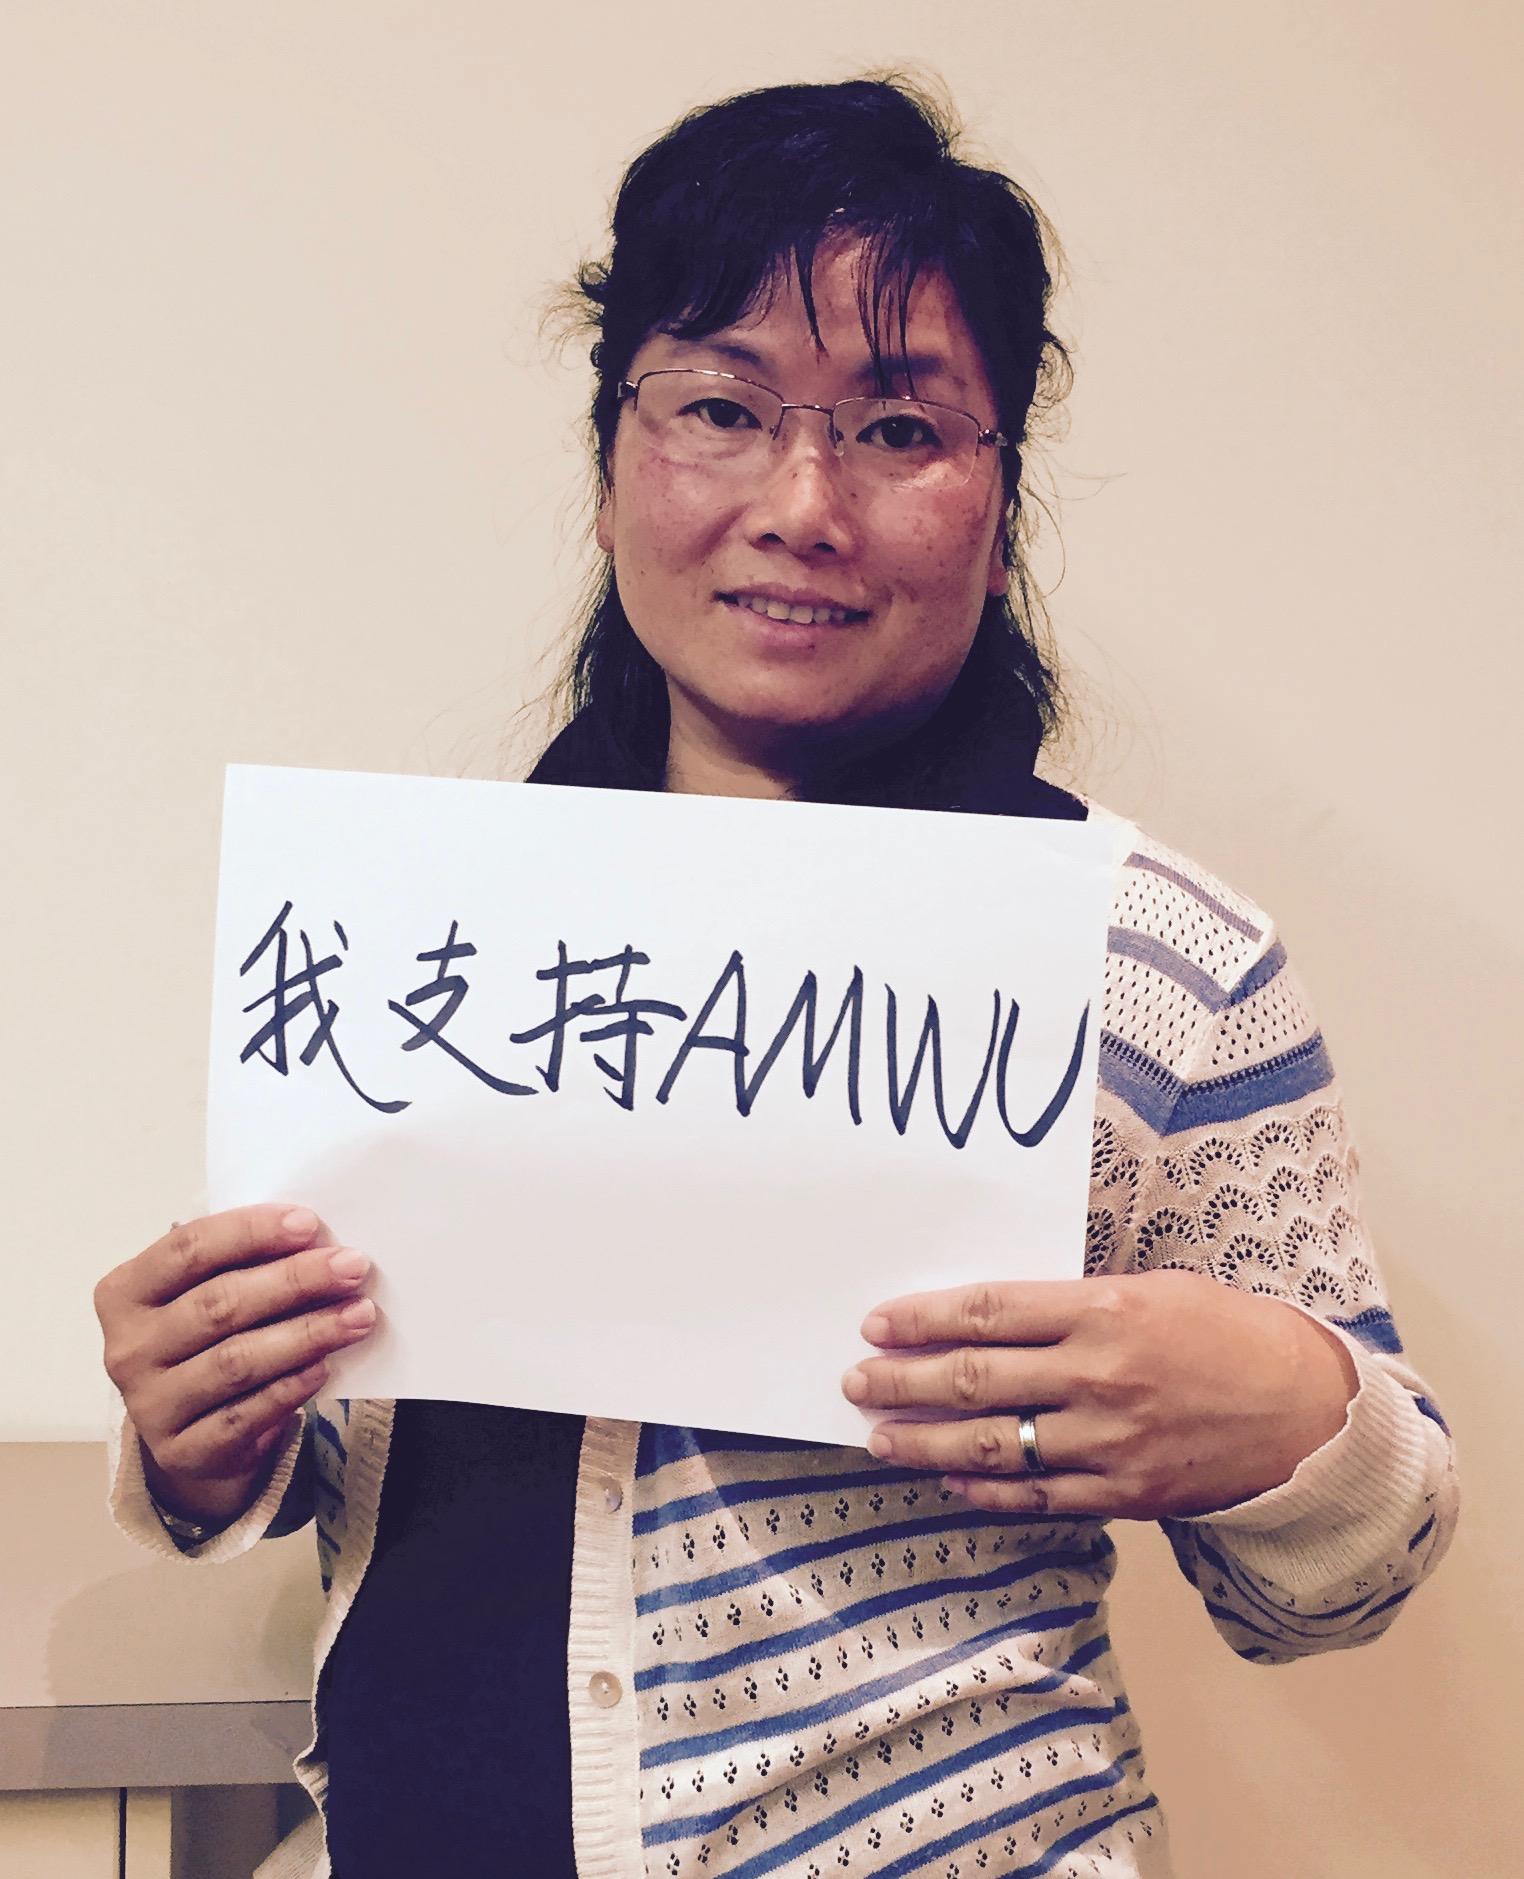 Vinh-Chinese_NY_(1).jpg